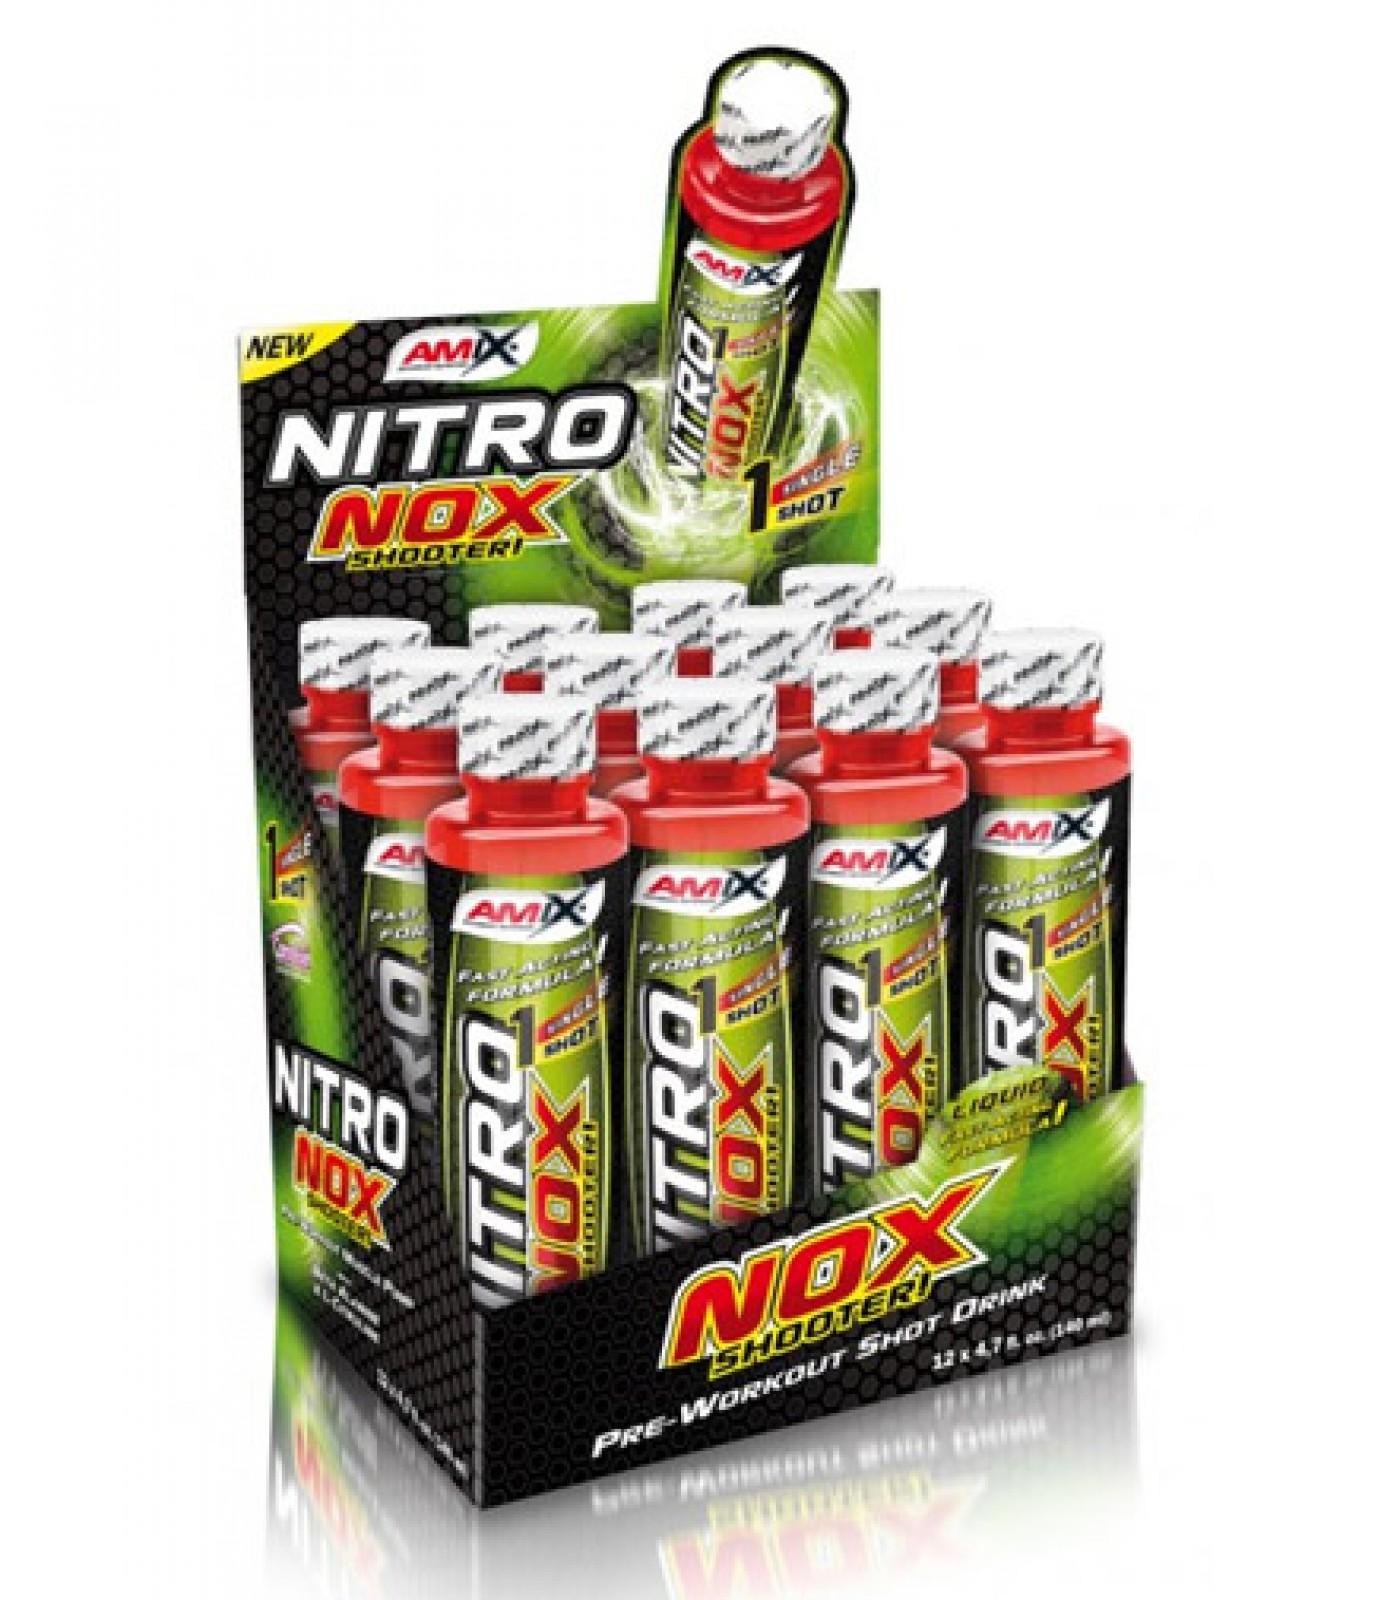 Amix - NitroNox ® Shooter / 12amp. x 140ml.